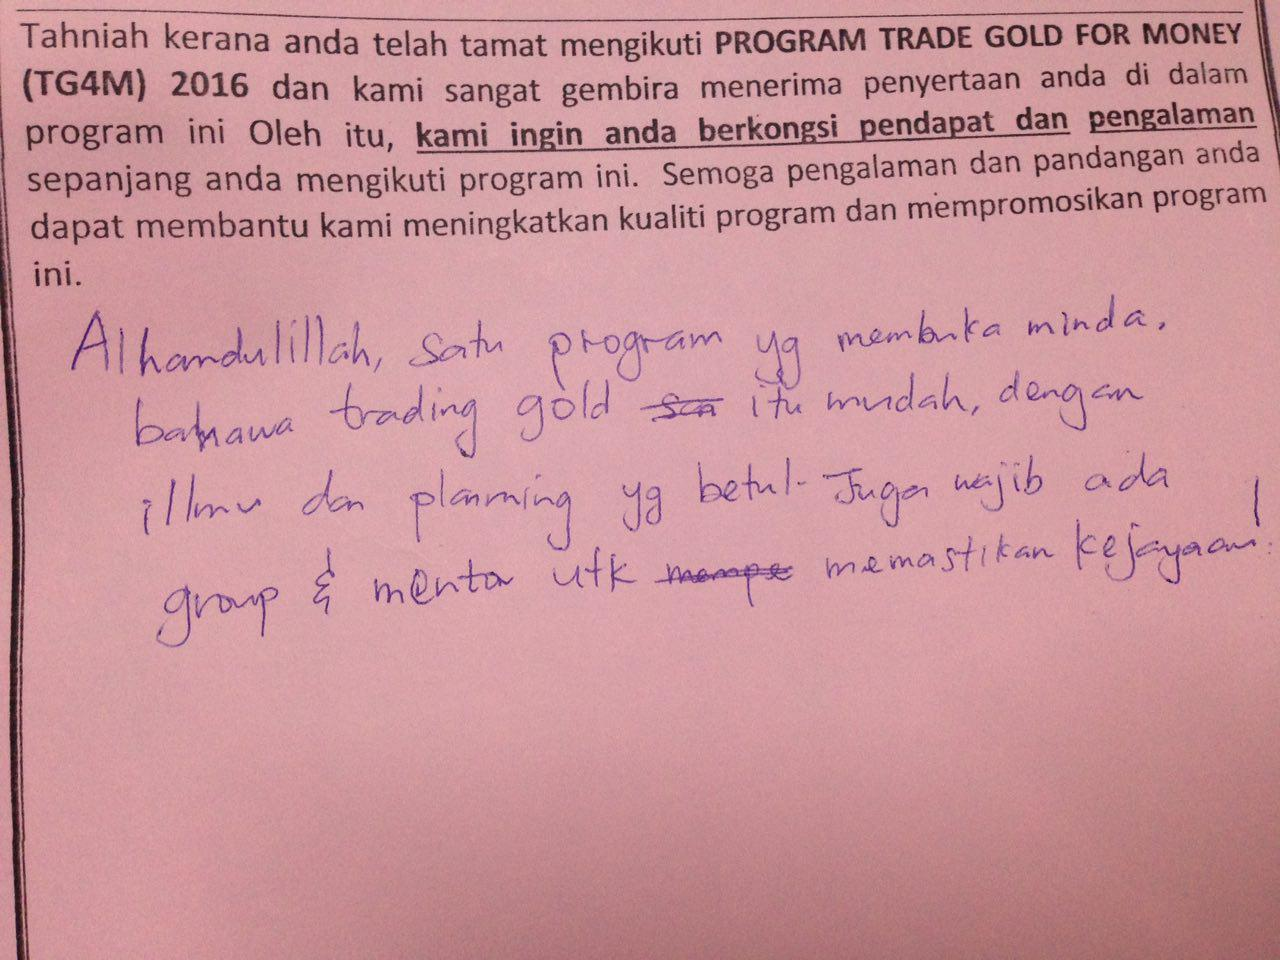 irsofian akademijl feedback gold trading 4